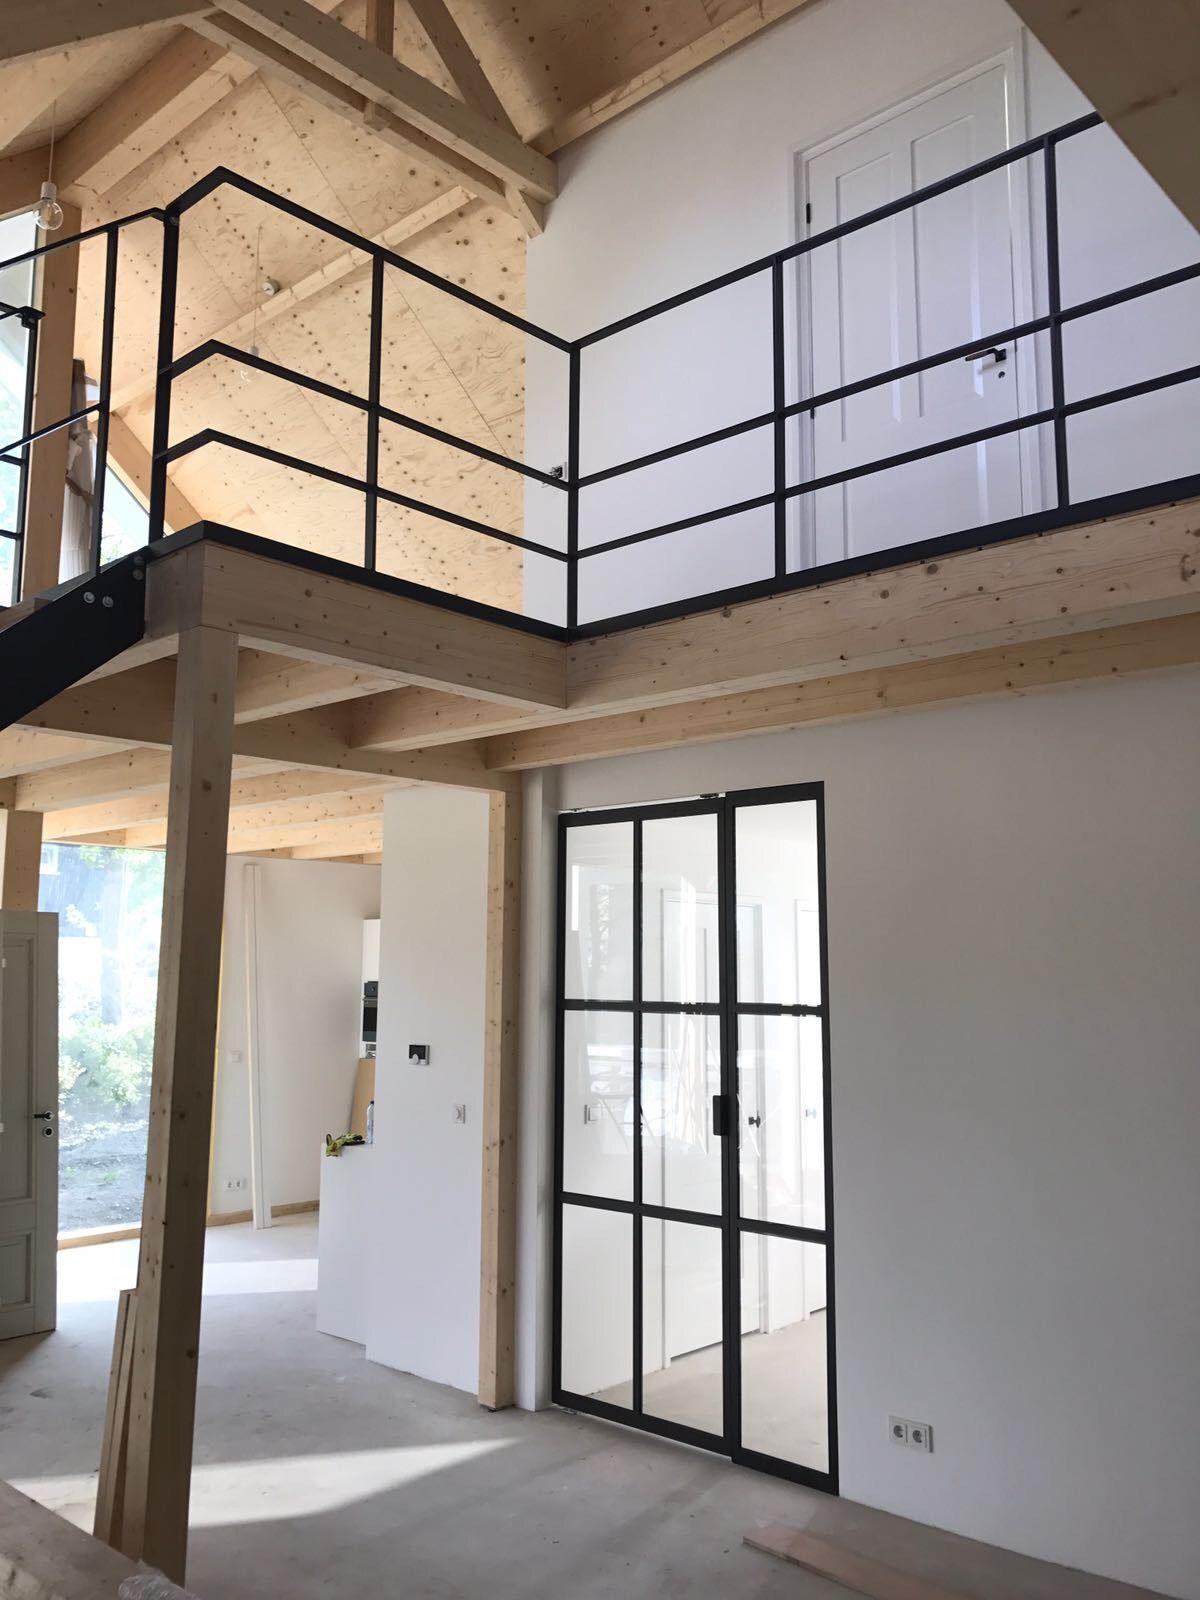 Schuurwoning Finnhouse 3760 te Kamperland Interieur P&B systeem met ...